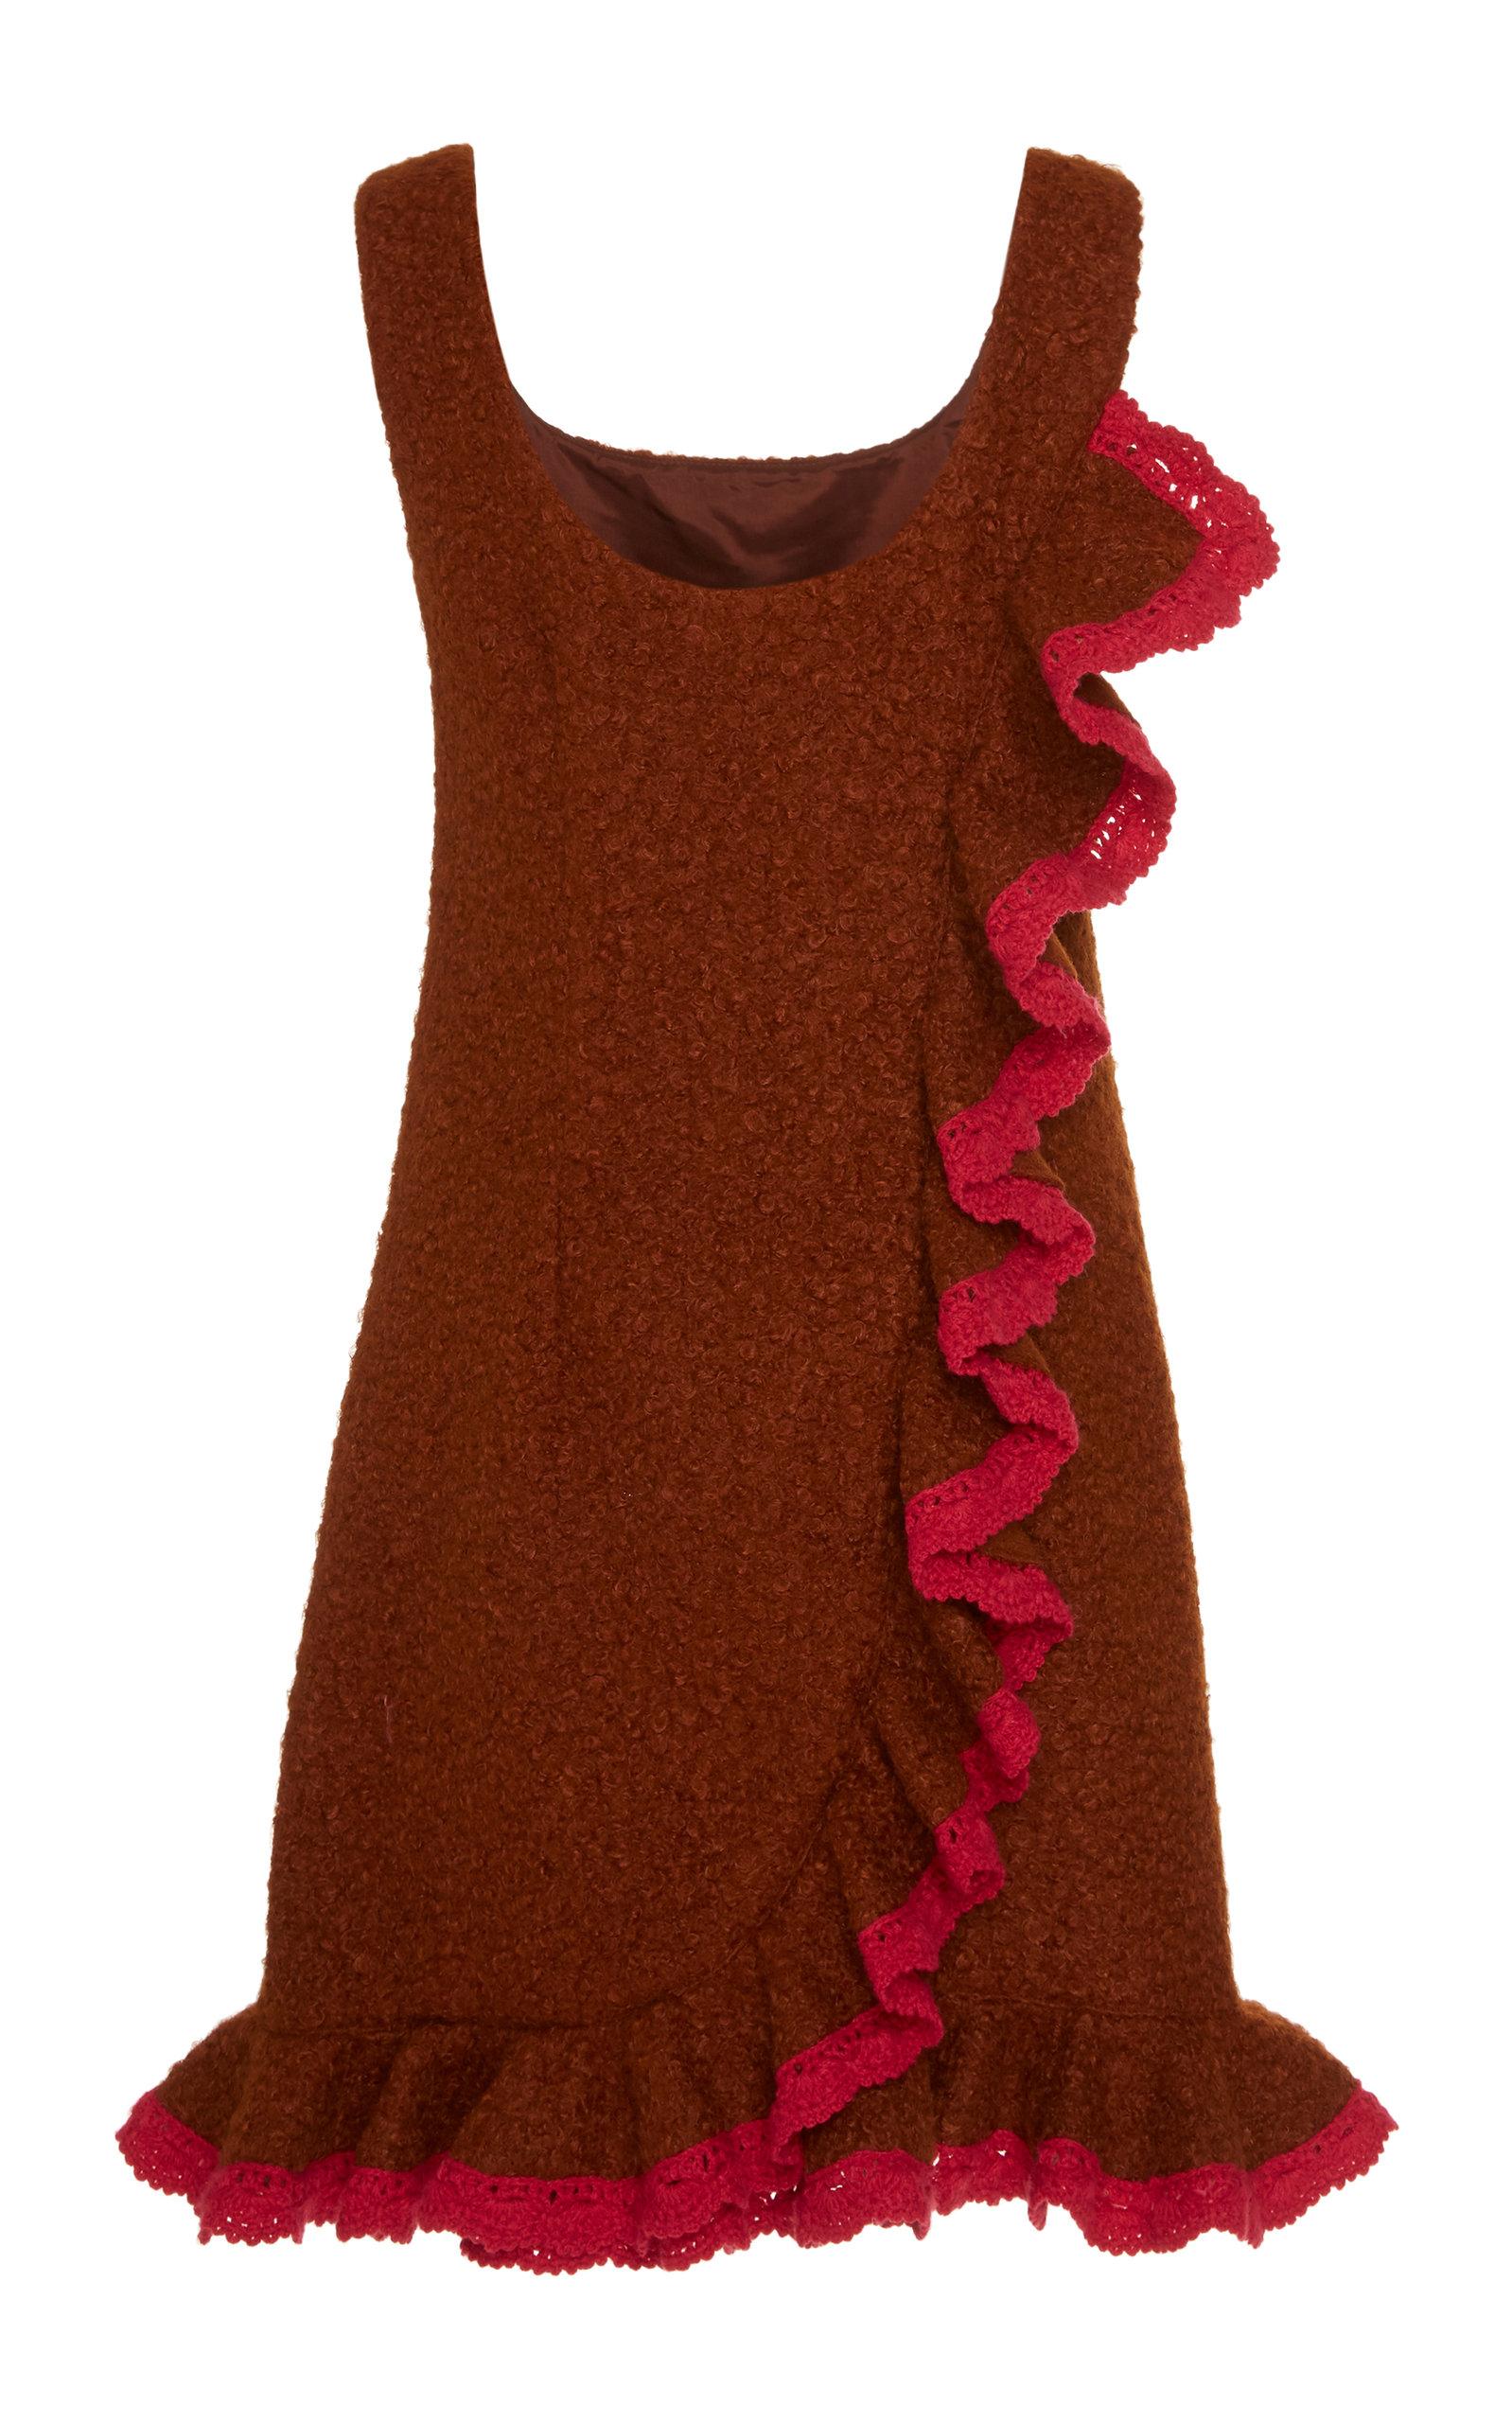 65e32fc8af Anna SuiBouclé Ruffled-Hem Jumper Dress. CLOSE. Loading. Loading